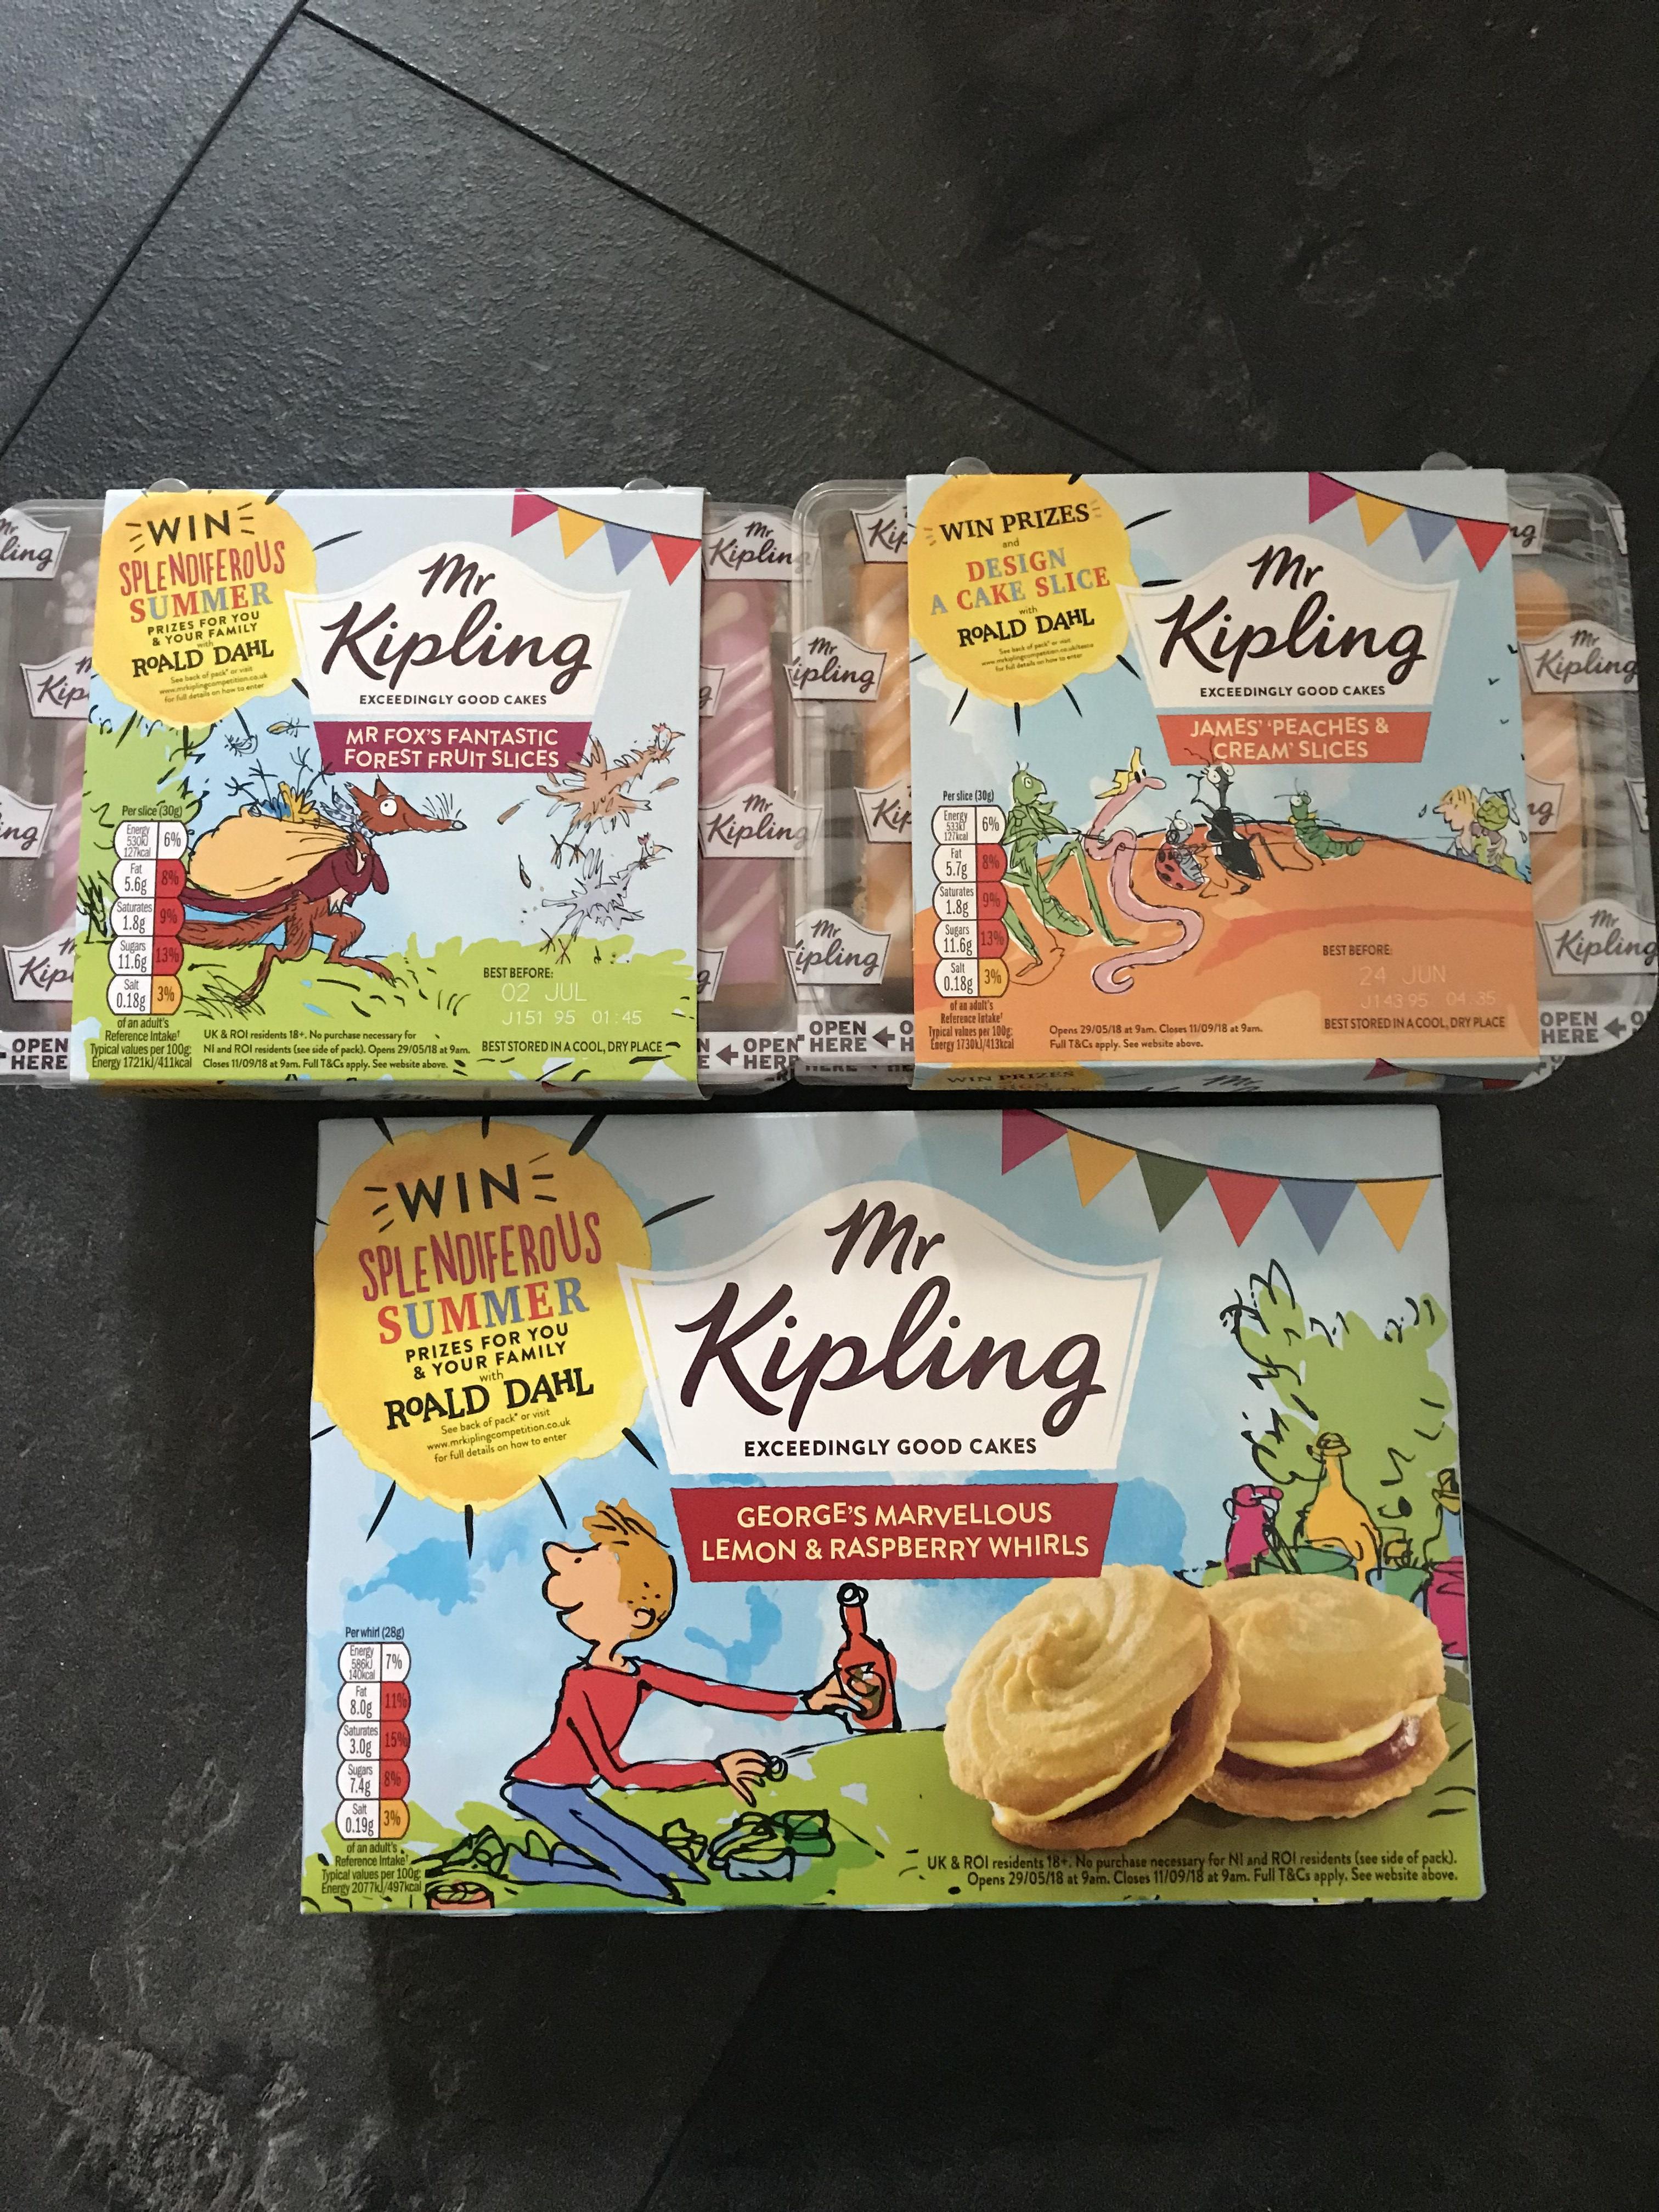 Mr Kipling limited edition Roald Dahl cakes £1 at Tesco